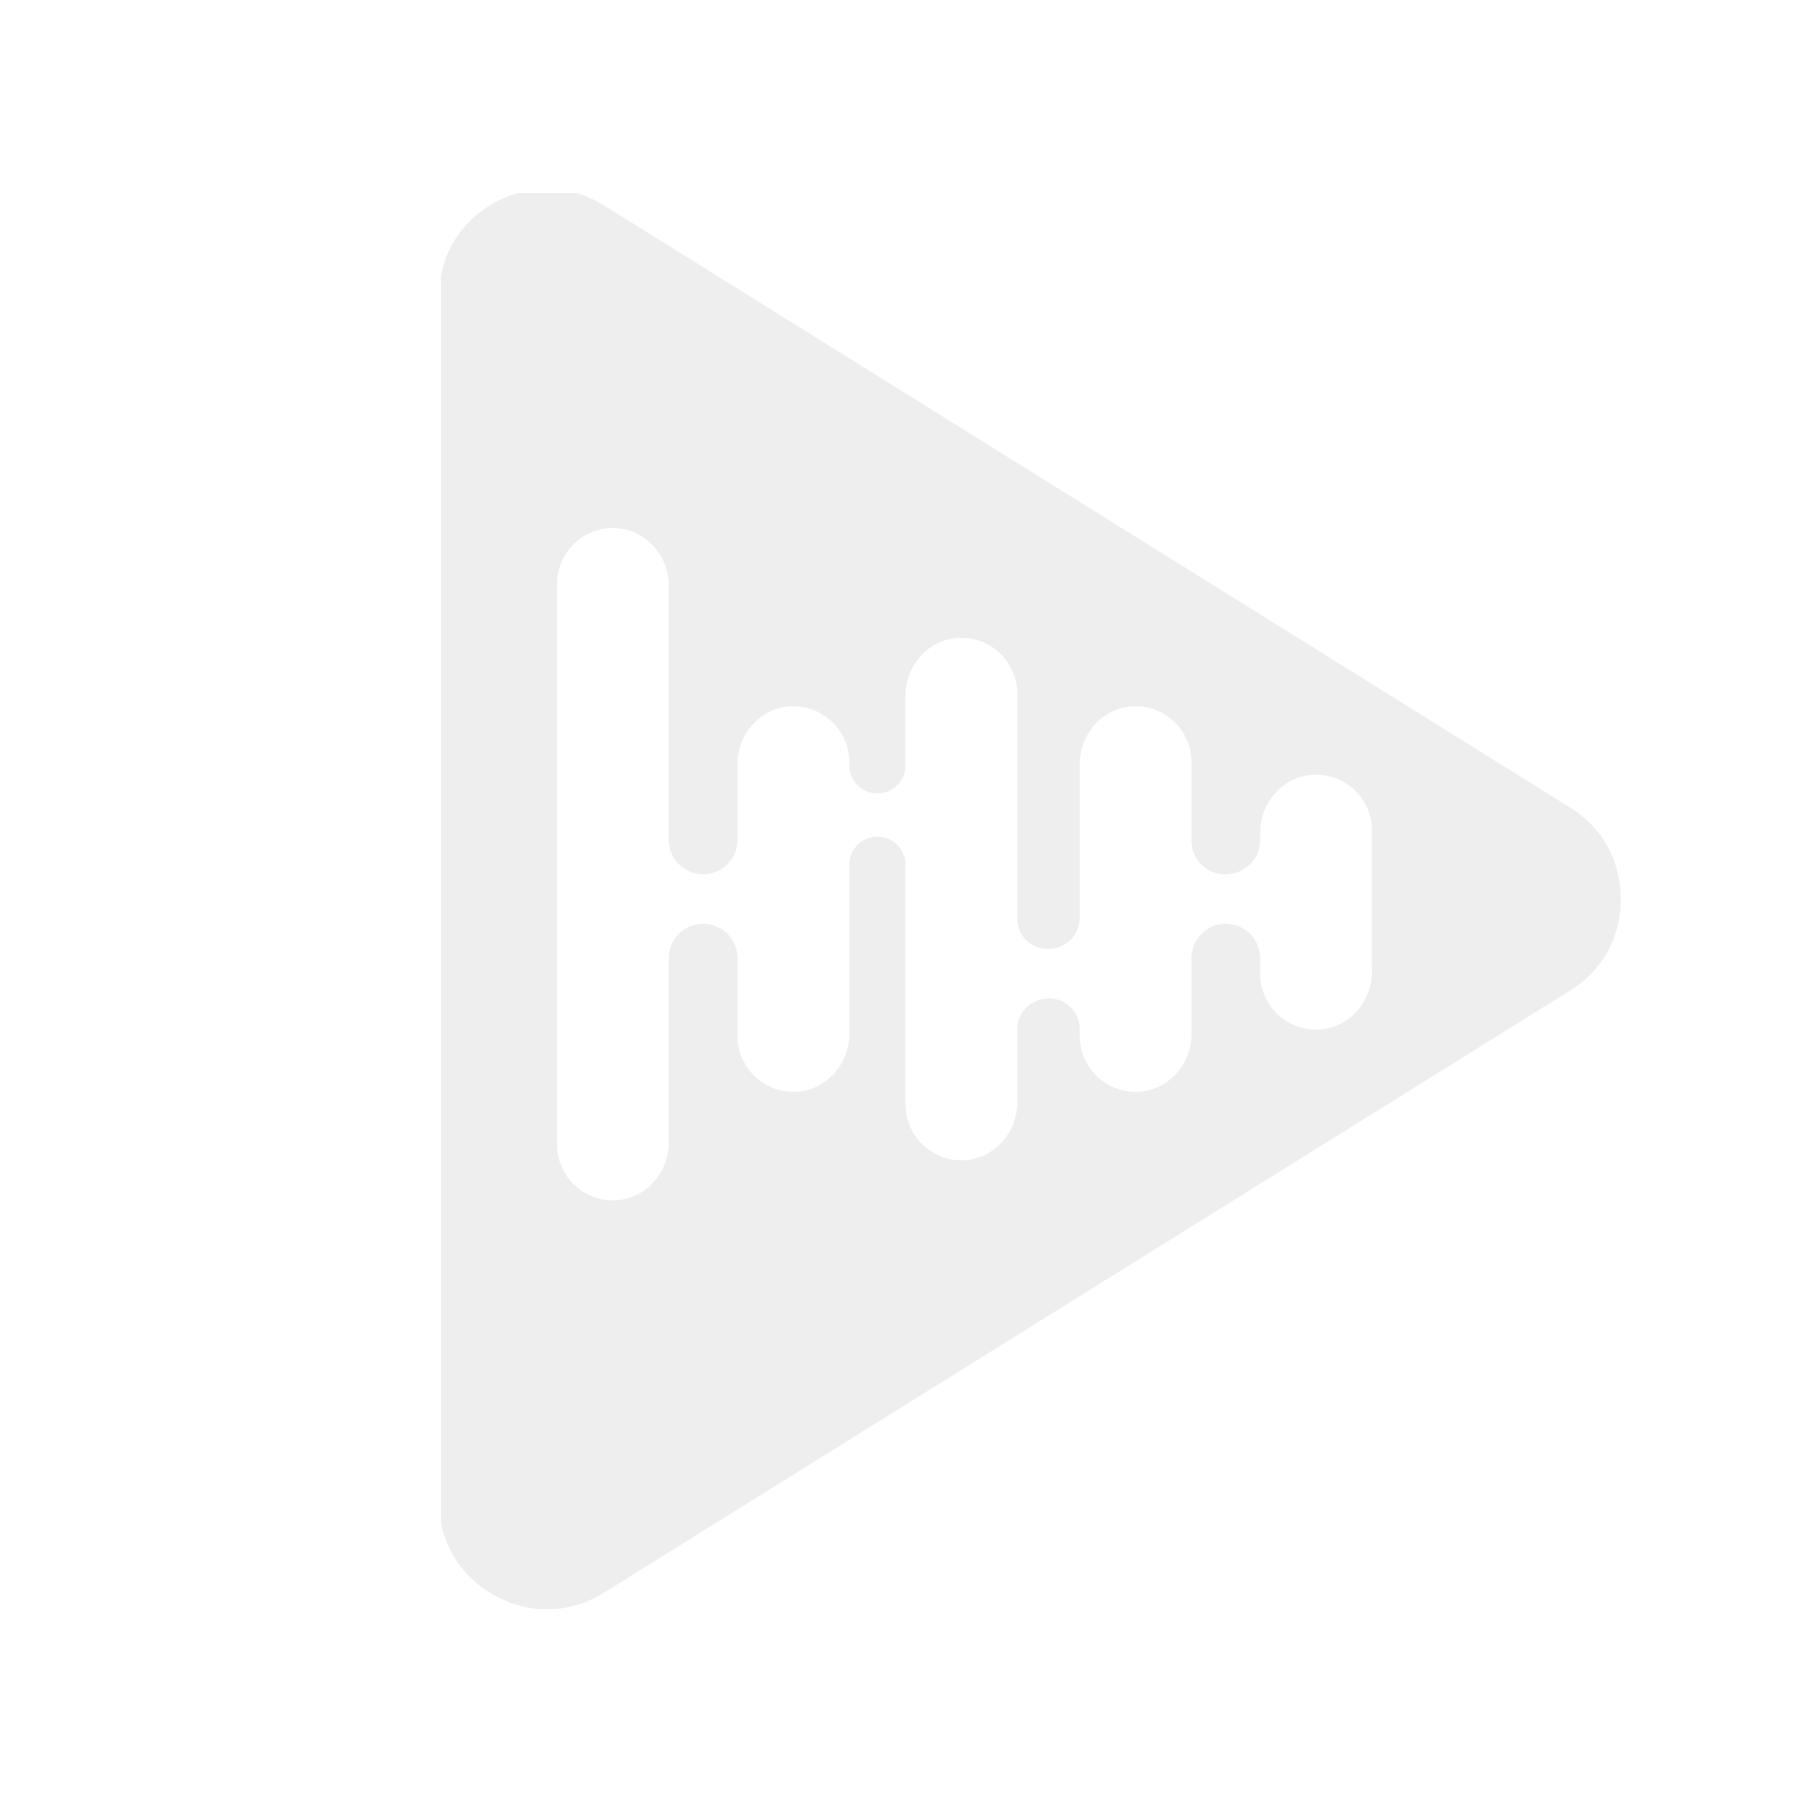 Speedsignal B-3414705-01